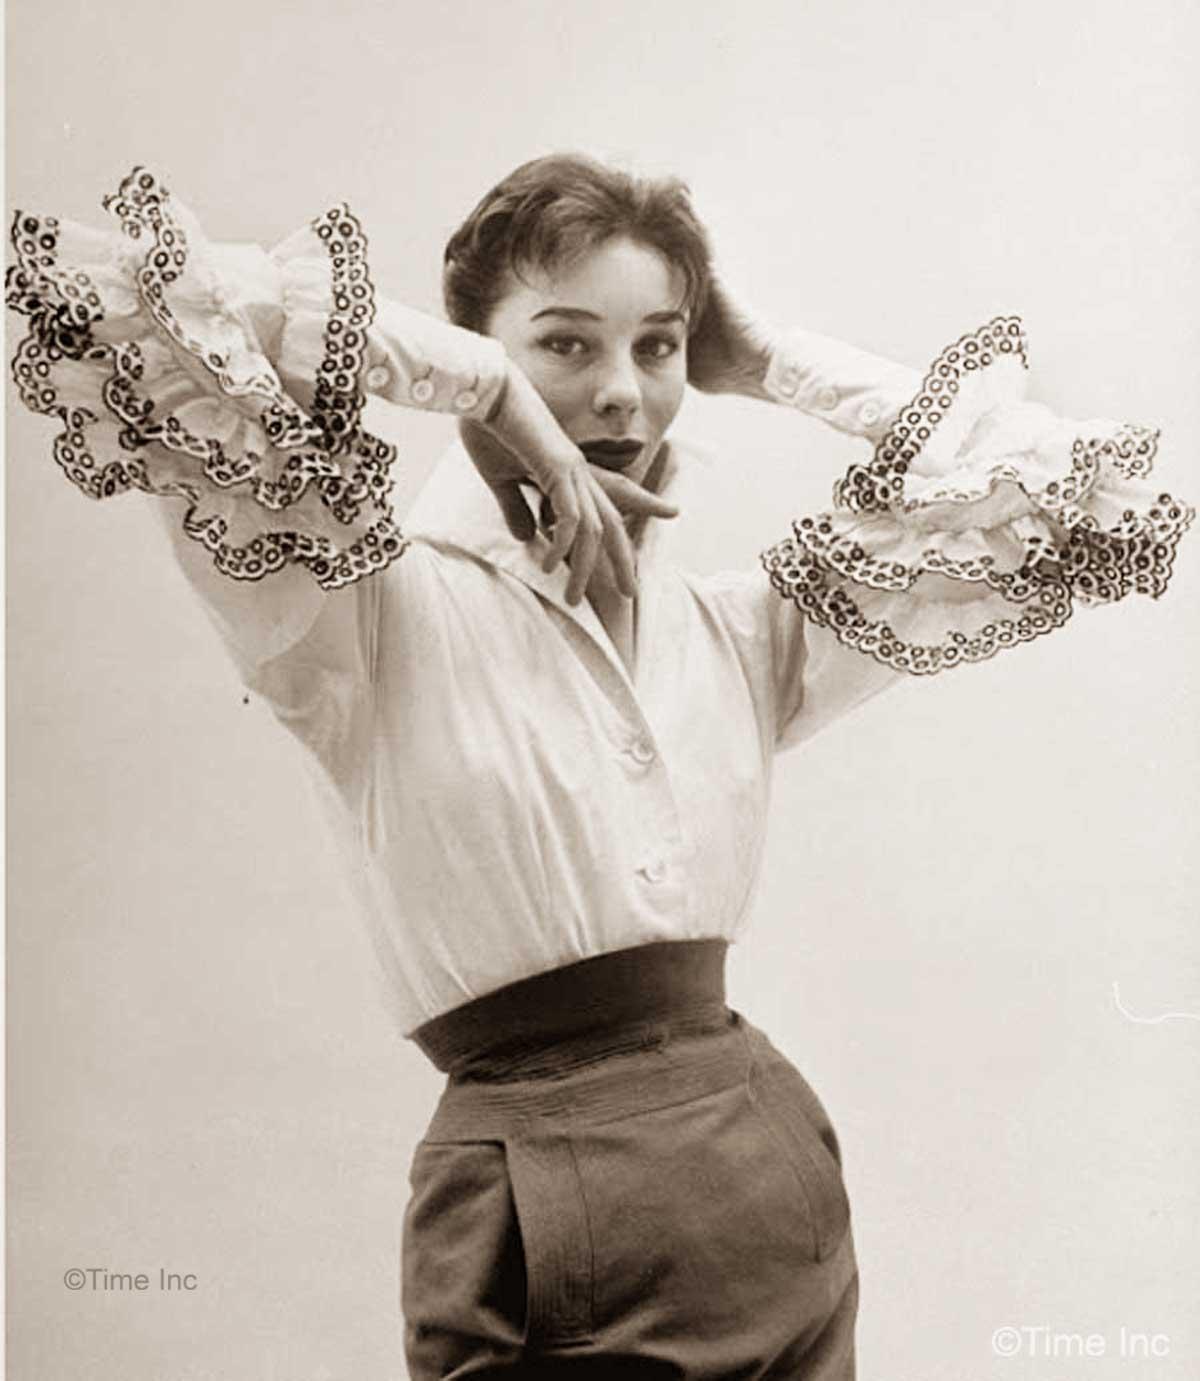 Givenchy-NR-Farbman-Model-Bettina-Life-Magazine-1952